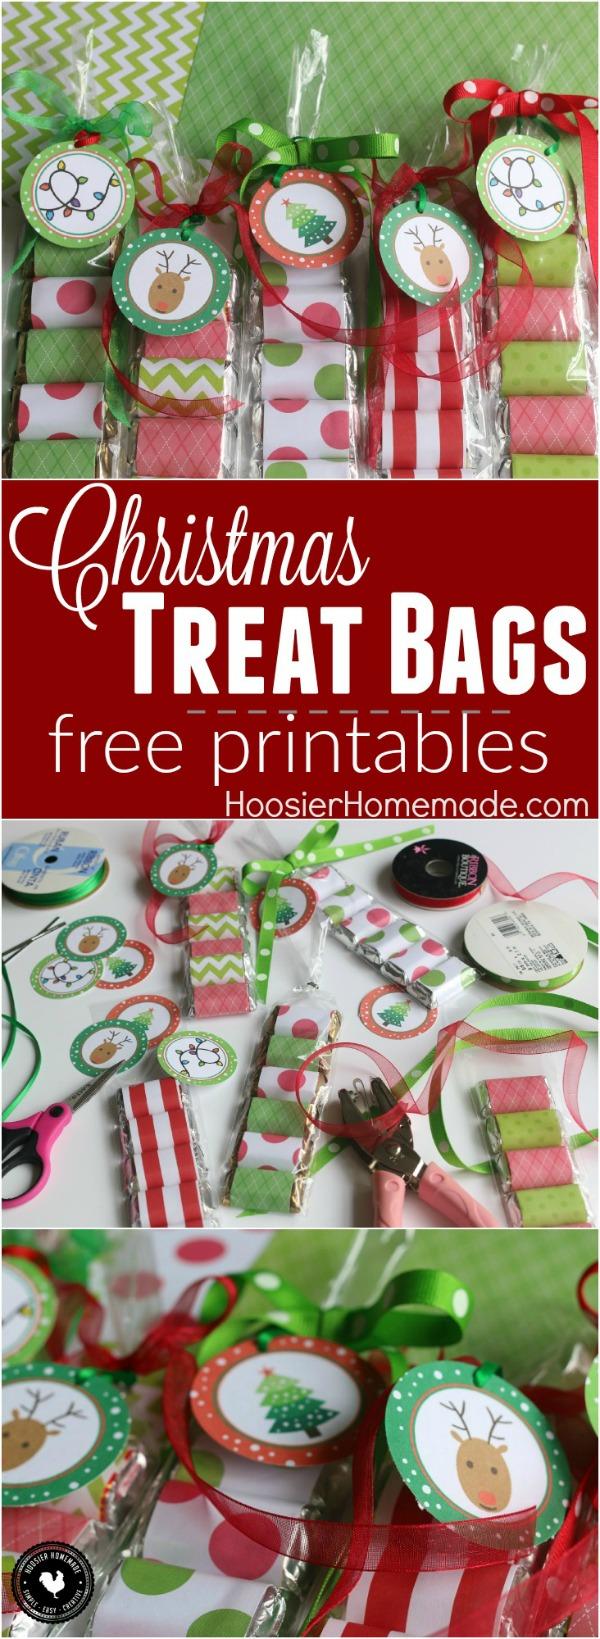 Christmas treat bags hoosier homemade